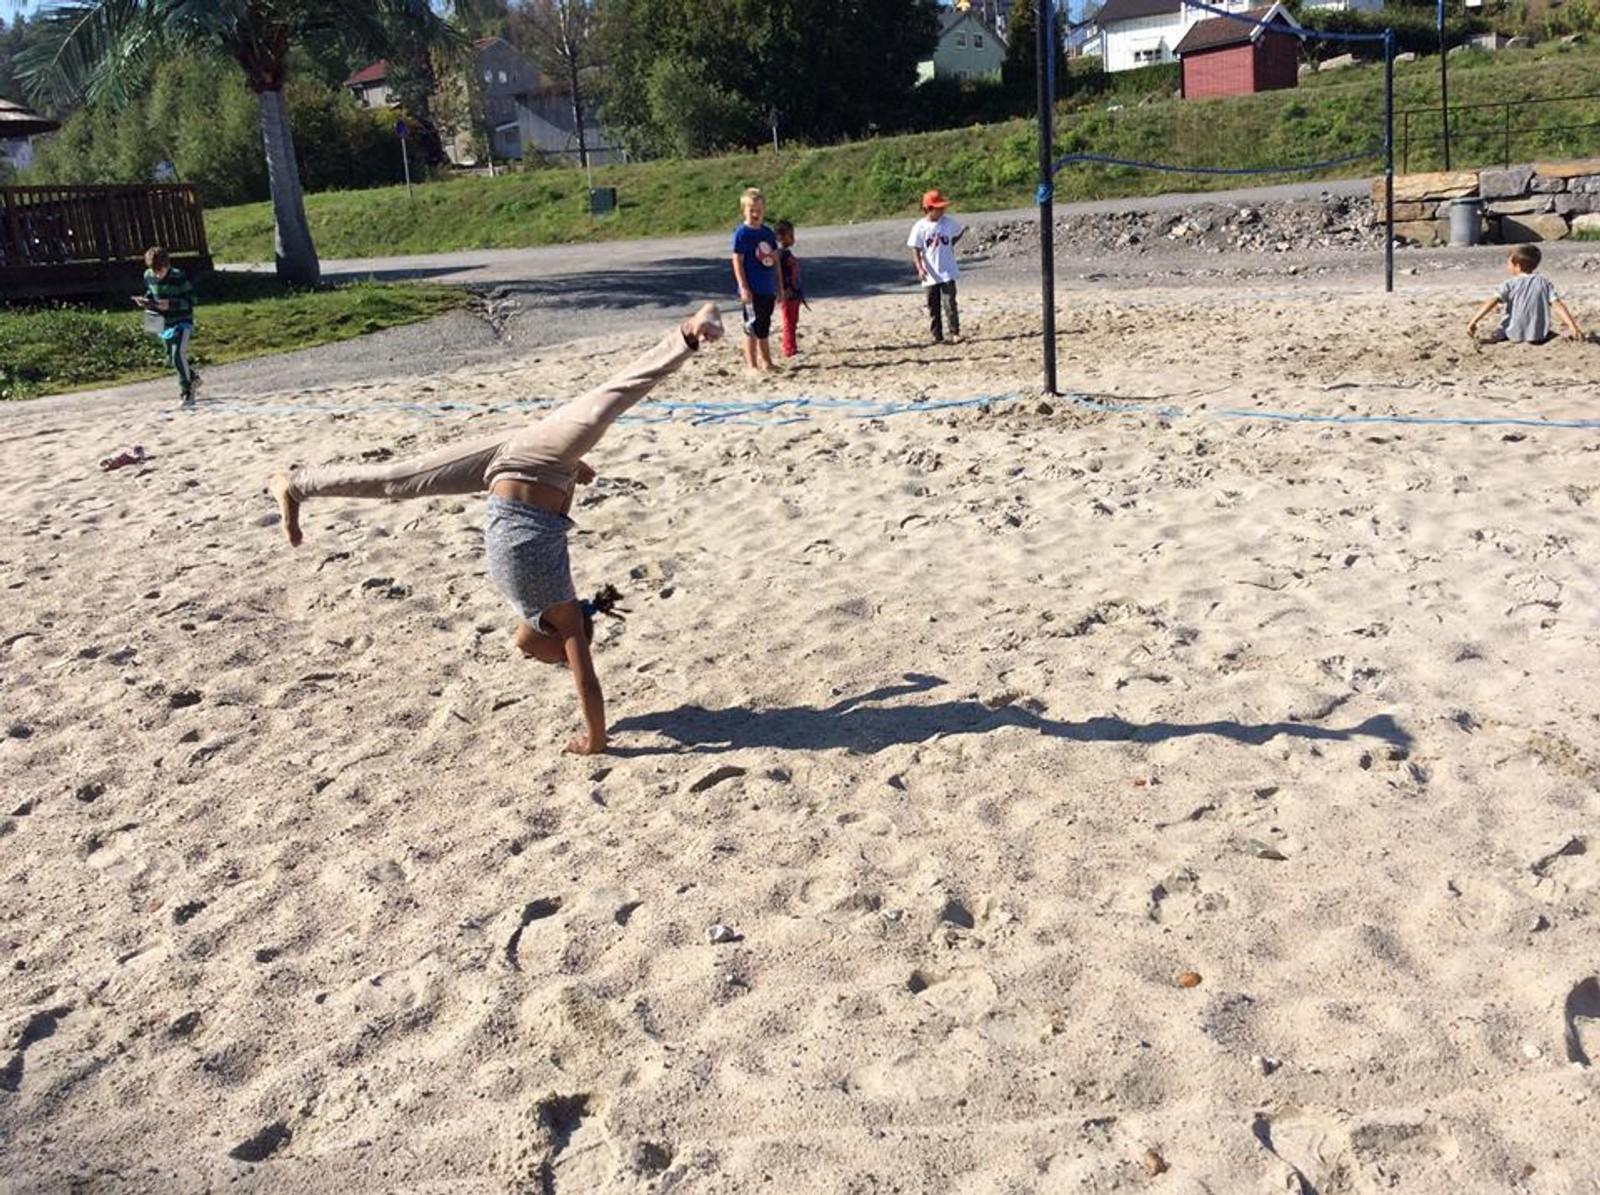 Trivsel ved Toke brygge. Aktive barn og ungdommer på sandvolleyballbanen.